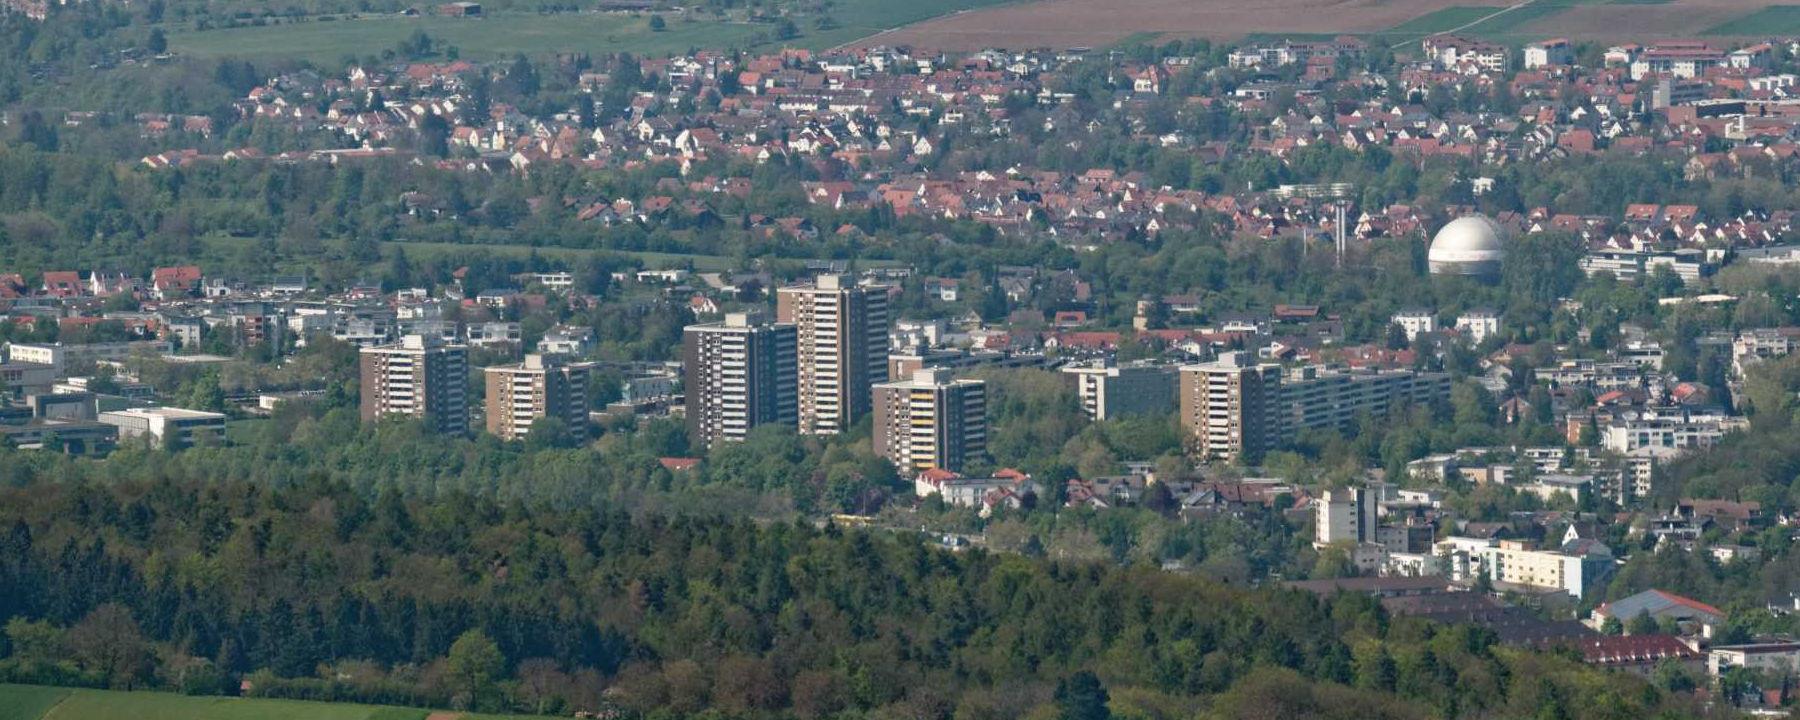 SVE Hohbuch Reutlingen